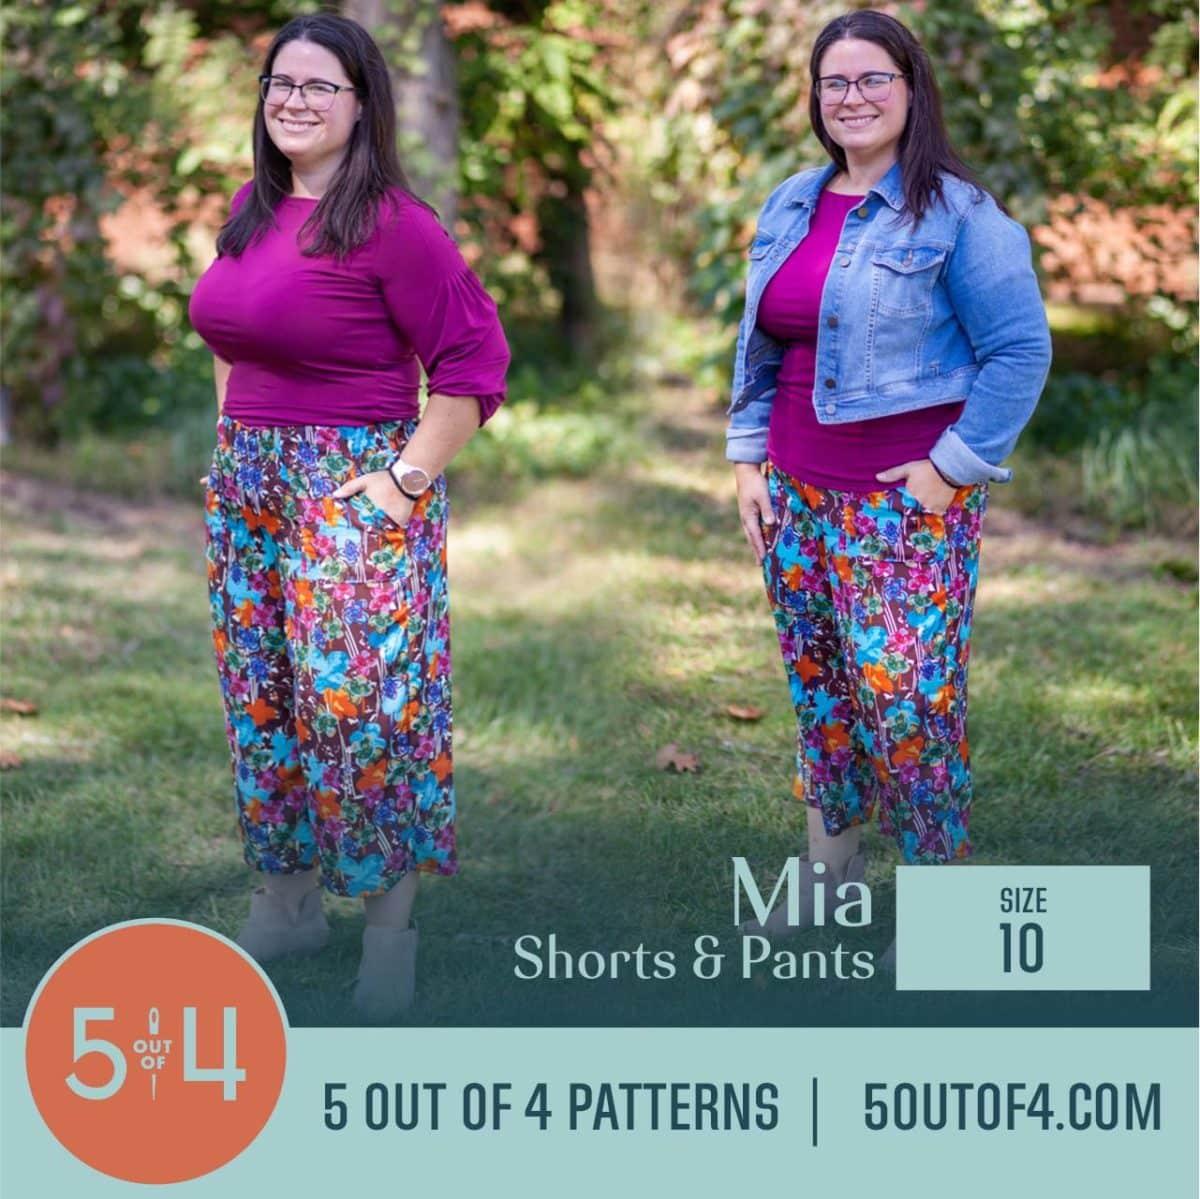 5oo4 Patterns Mia Pants size 10